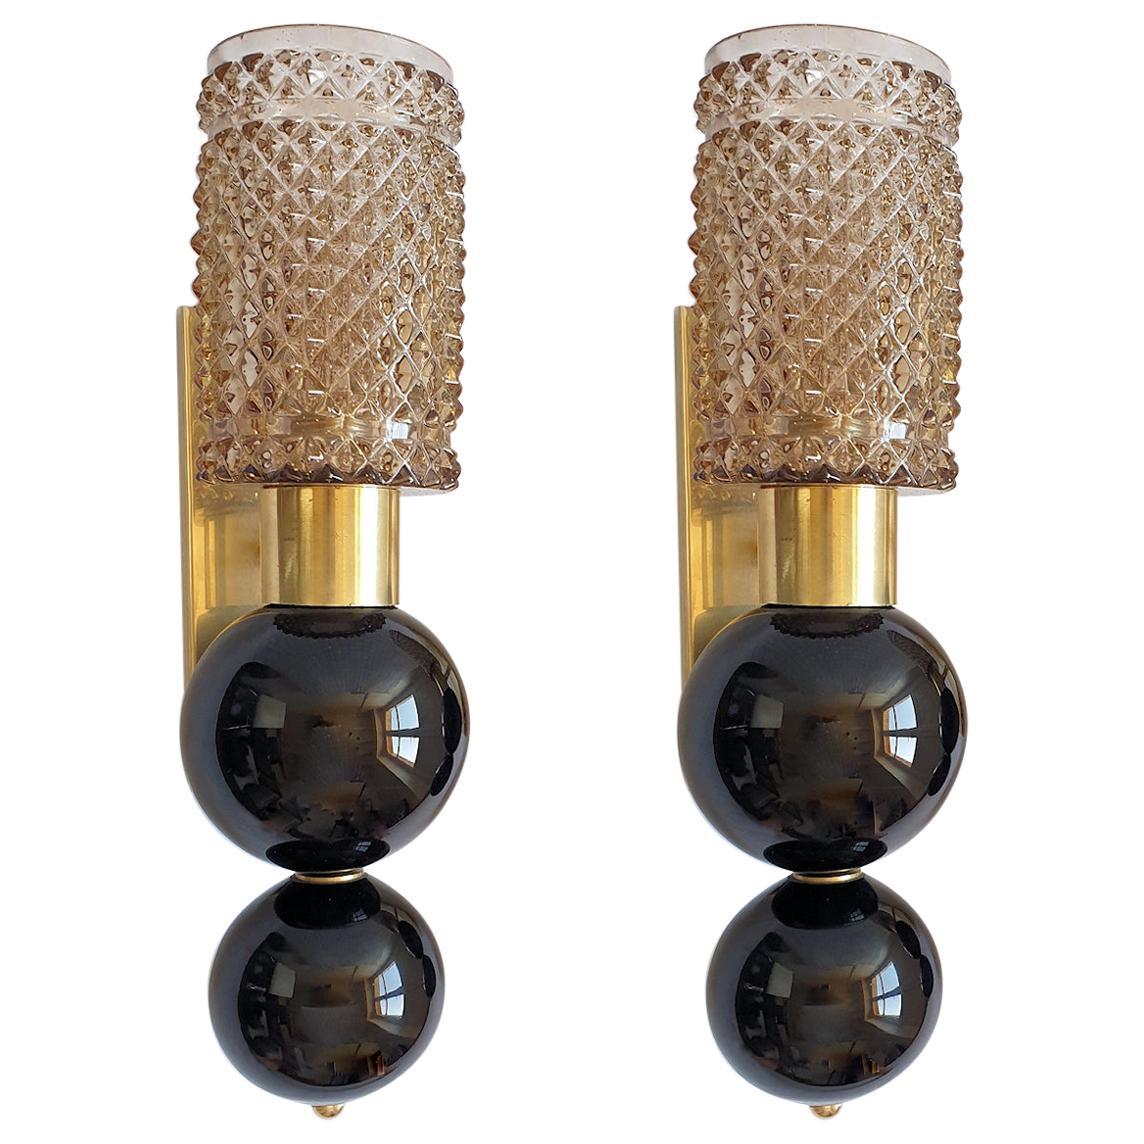 Pairs of Beige & Black Murano Glass Mid Century Sconces Venini Style Italy 1970s